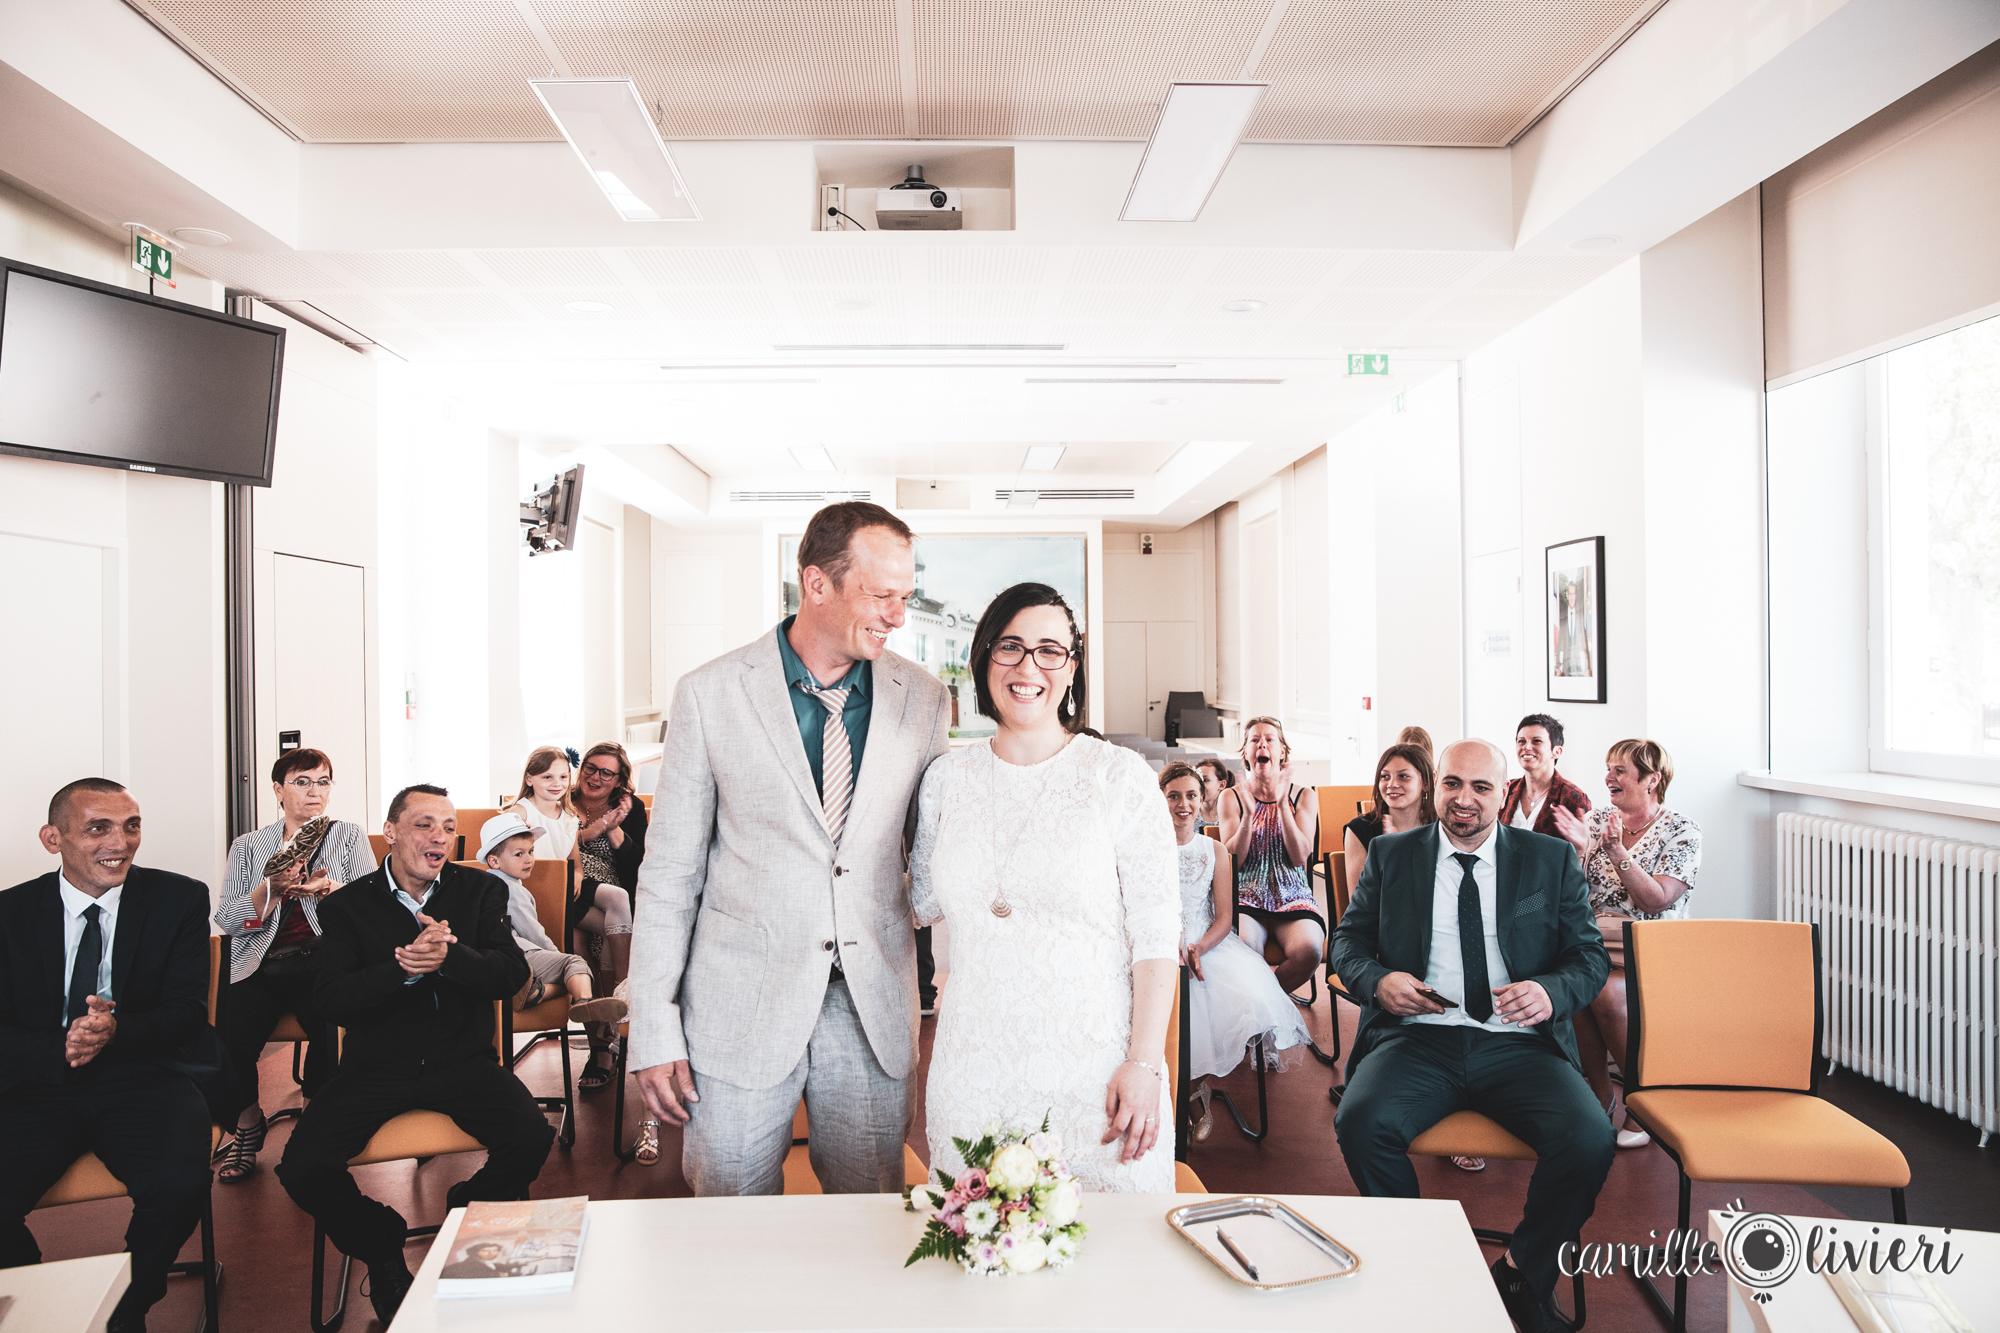 photographe_grenoble_mariage-camille-olivieri-50